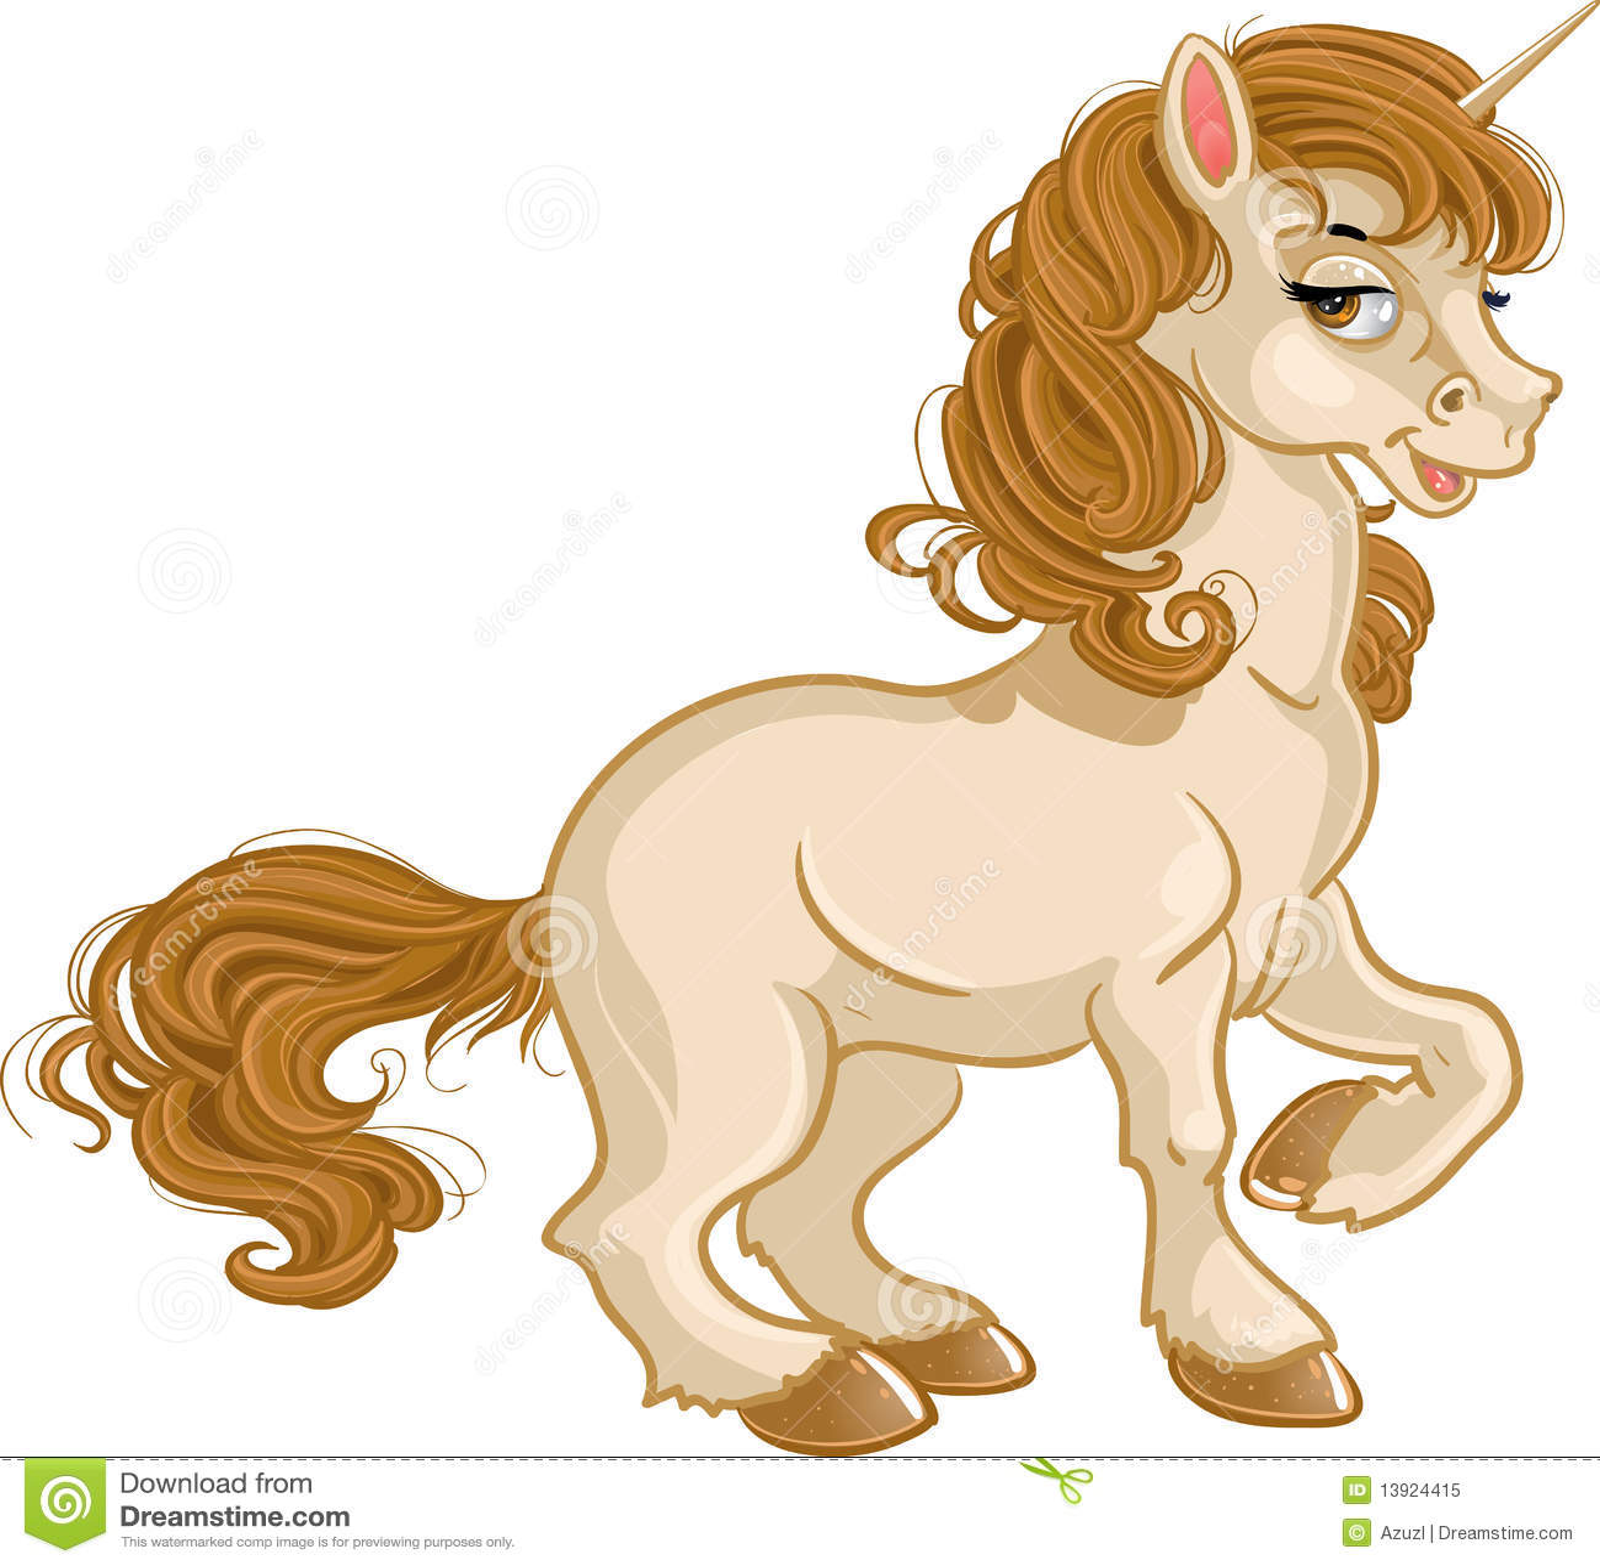 Unicornio bastante fabuloso